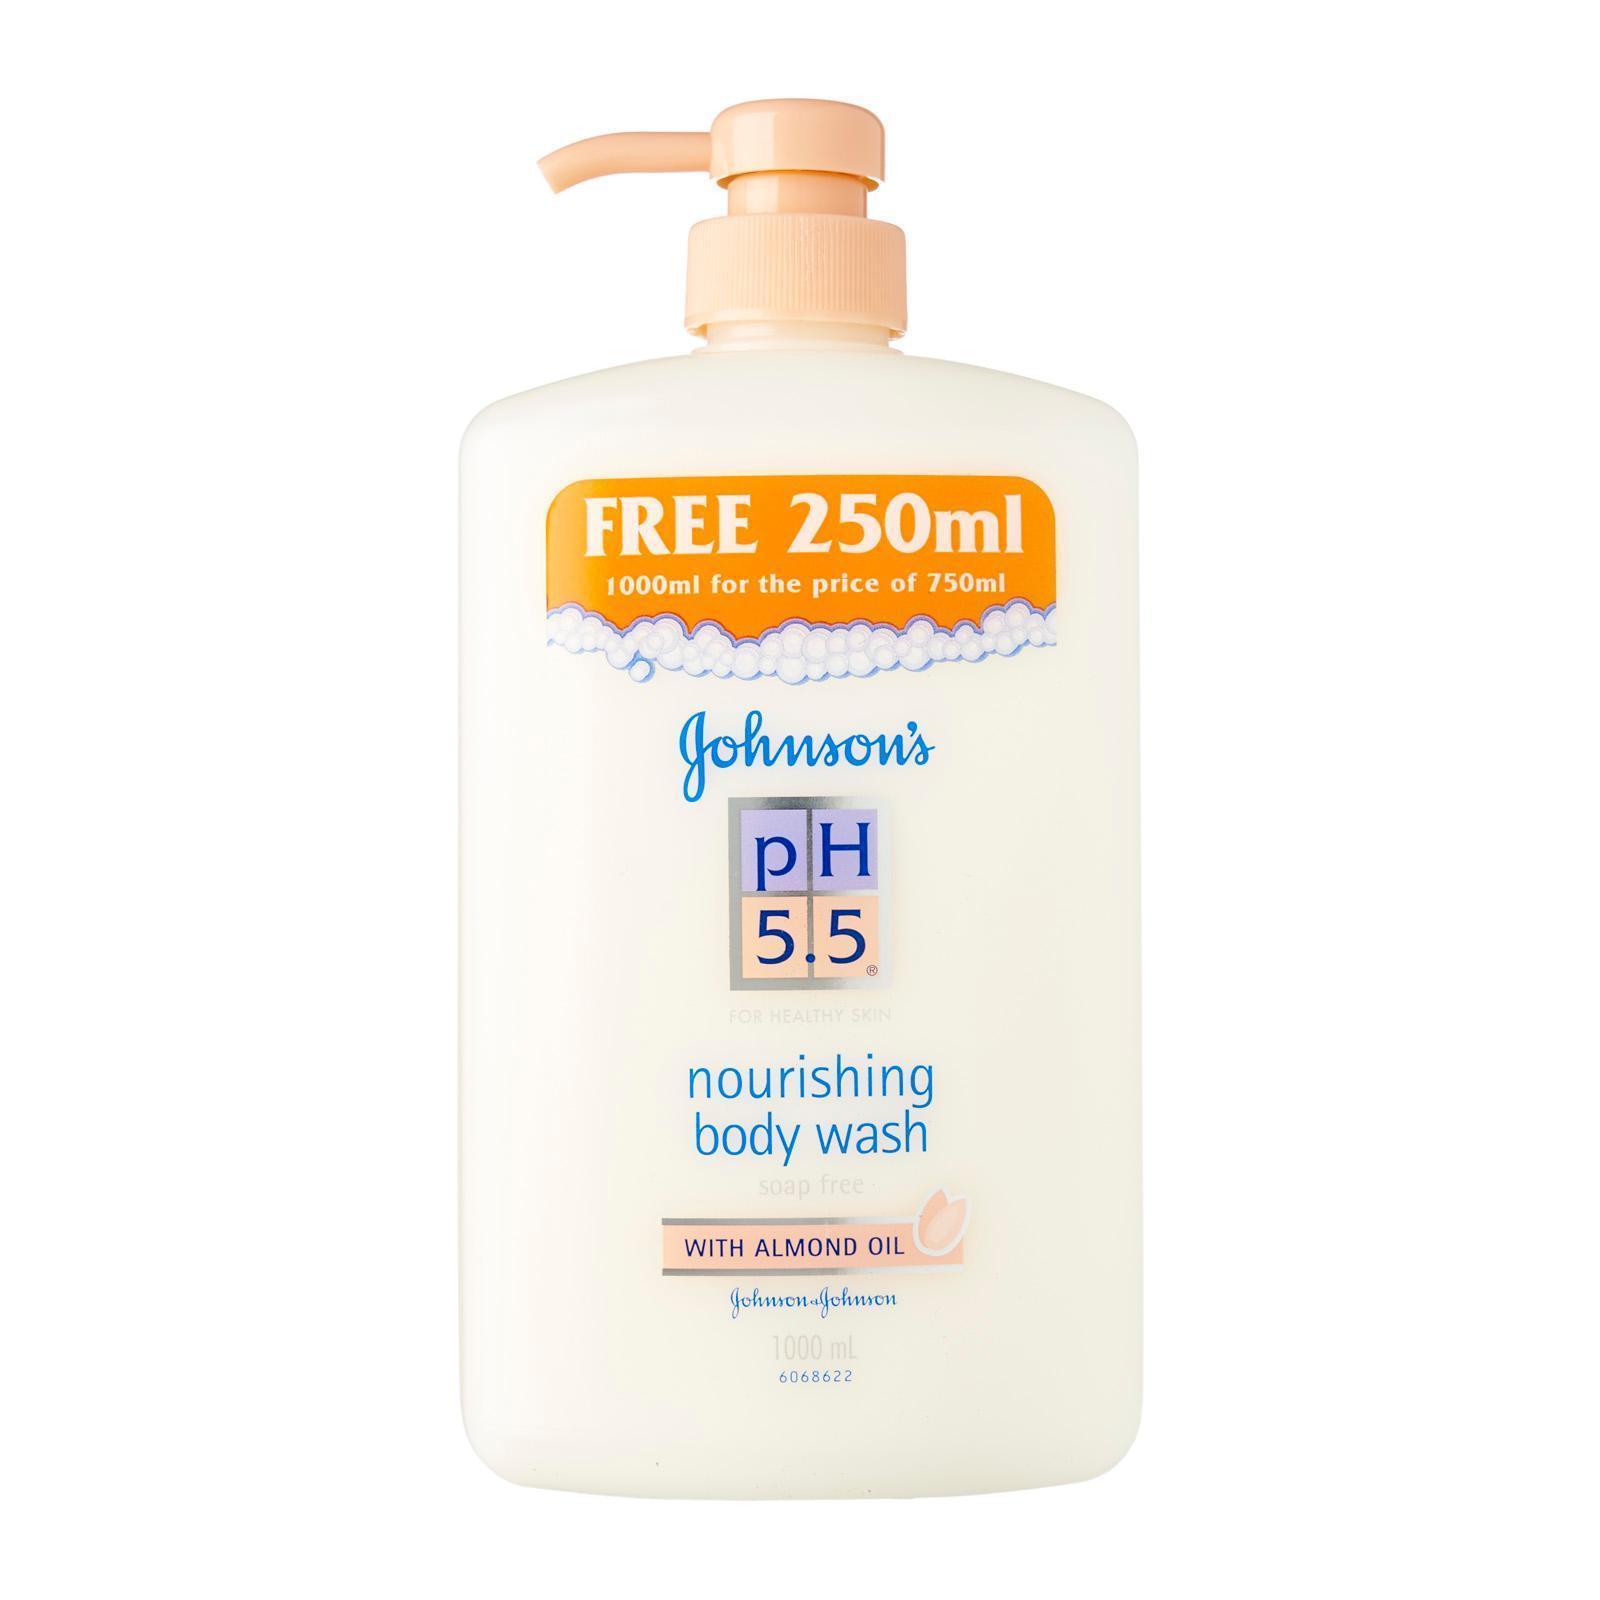 pH 5.5 Nourishing Body Wash With Almond Oil